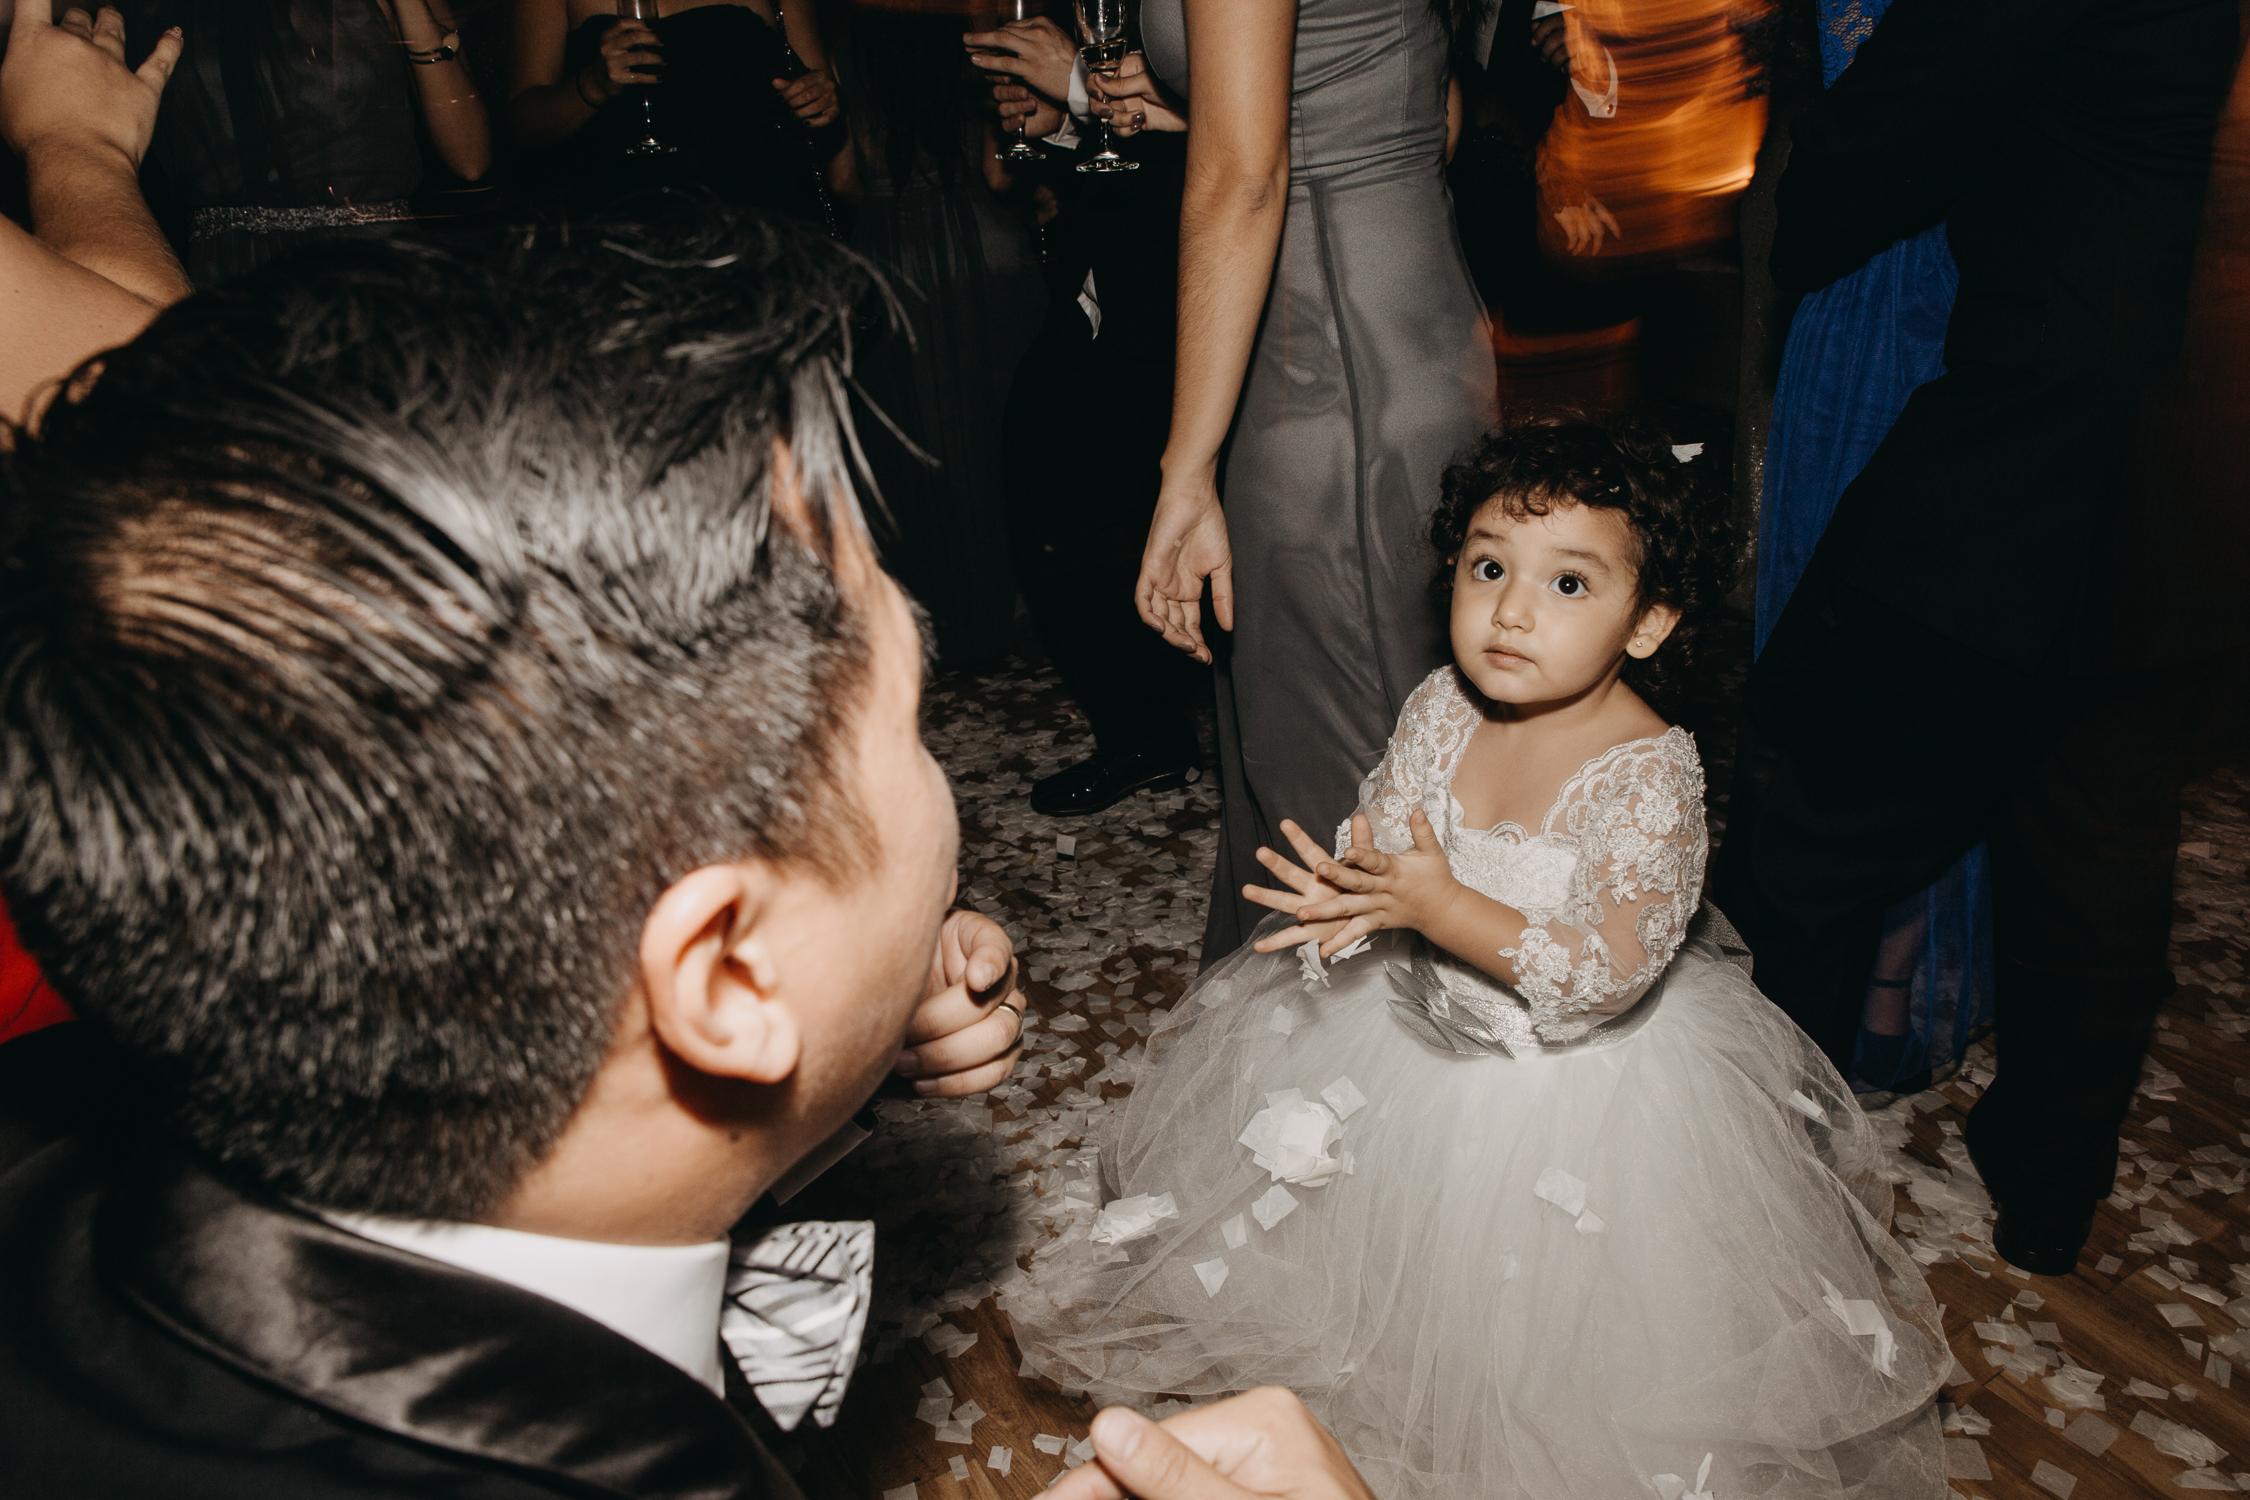 Michelle-Agurto-Fotografia-Bodas-Ecuador-Destination-Wedding-Photographer-Vicky-Javier-240.JPG